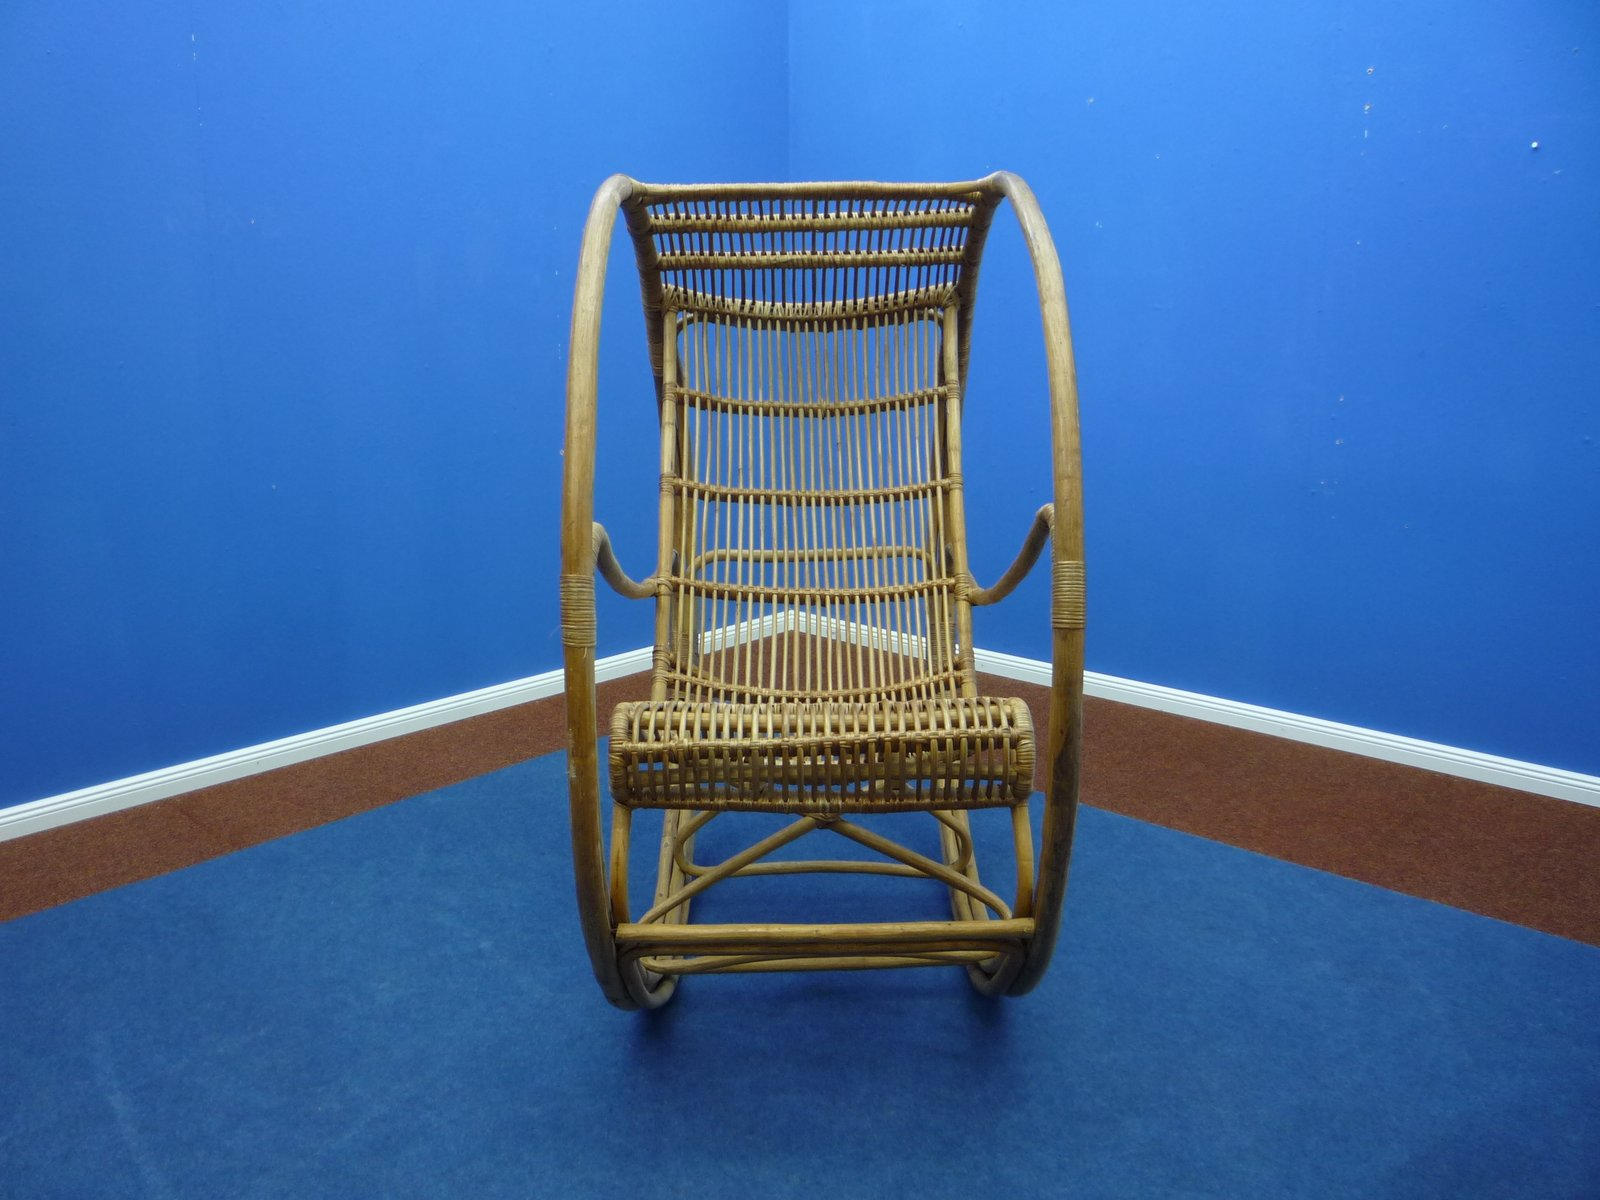 rattan korbgeflecht schaukelstuhl 1960s bei pamono kaufen. Black Bedroom Furniture Sets. Home Design Ideas